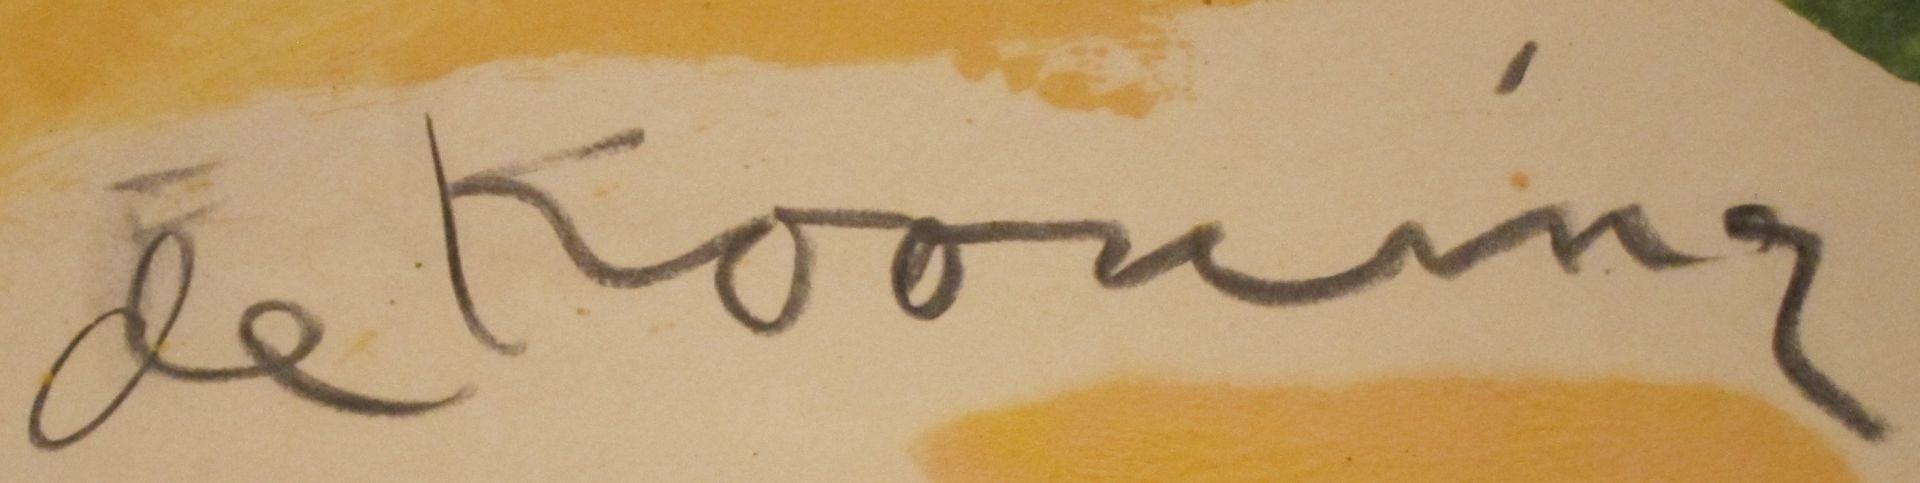 signature Willem DE KOONING